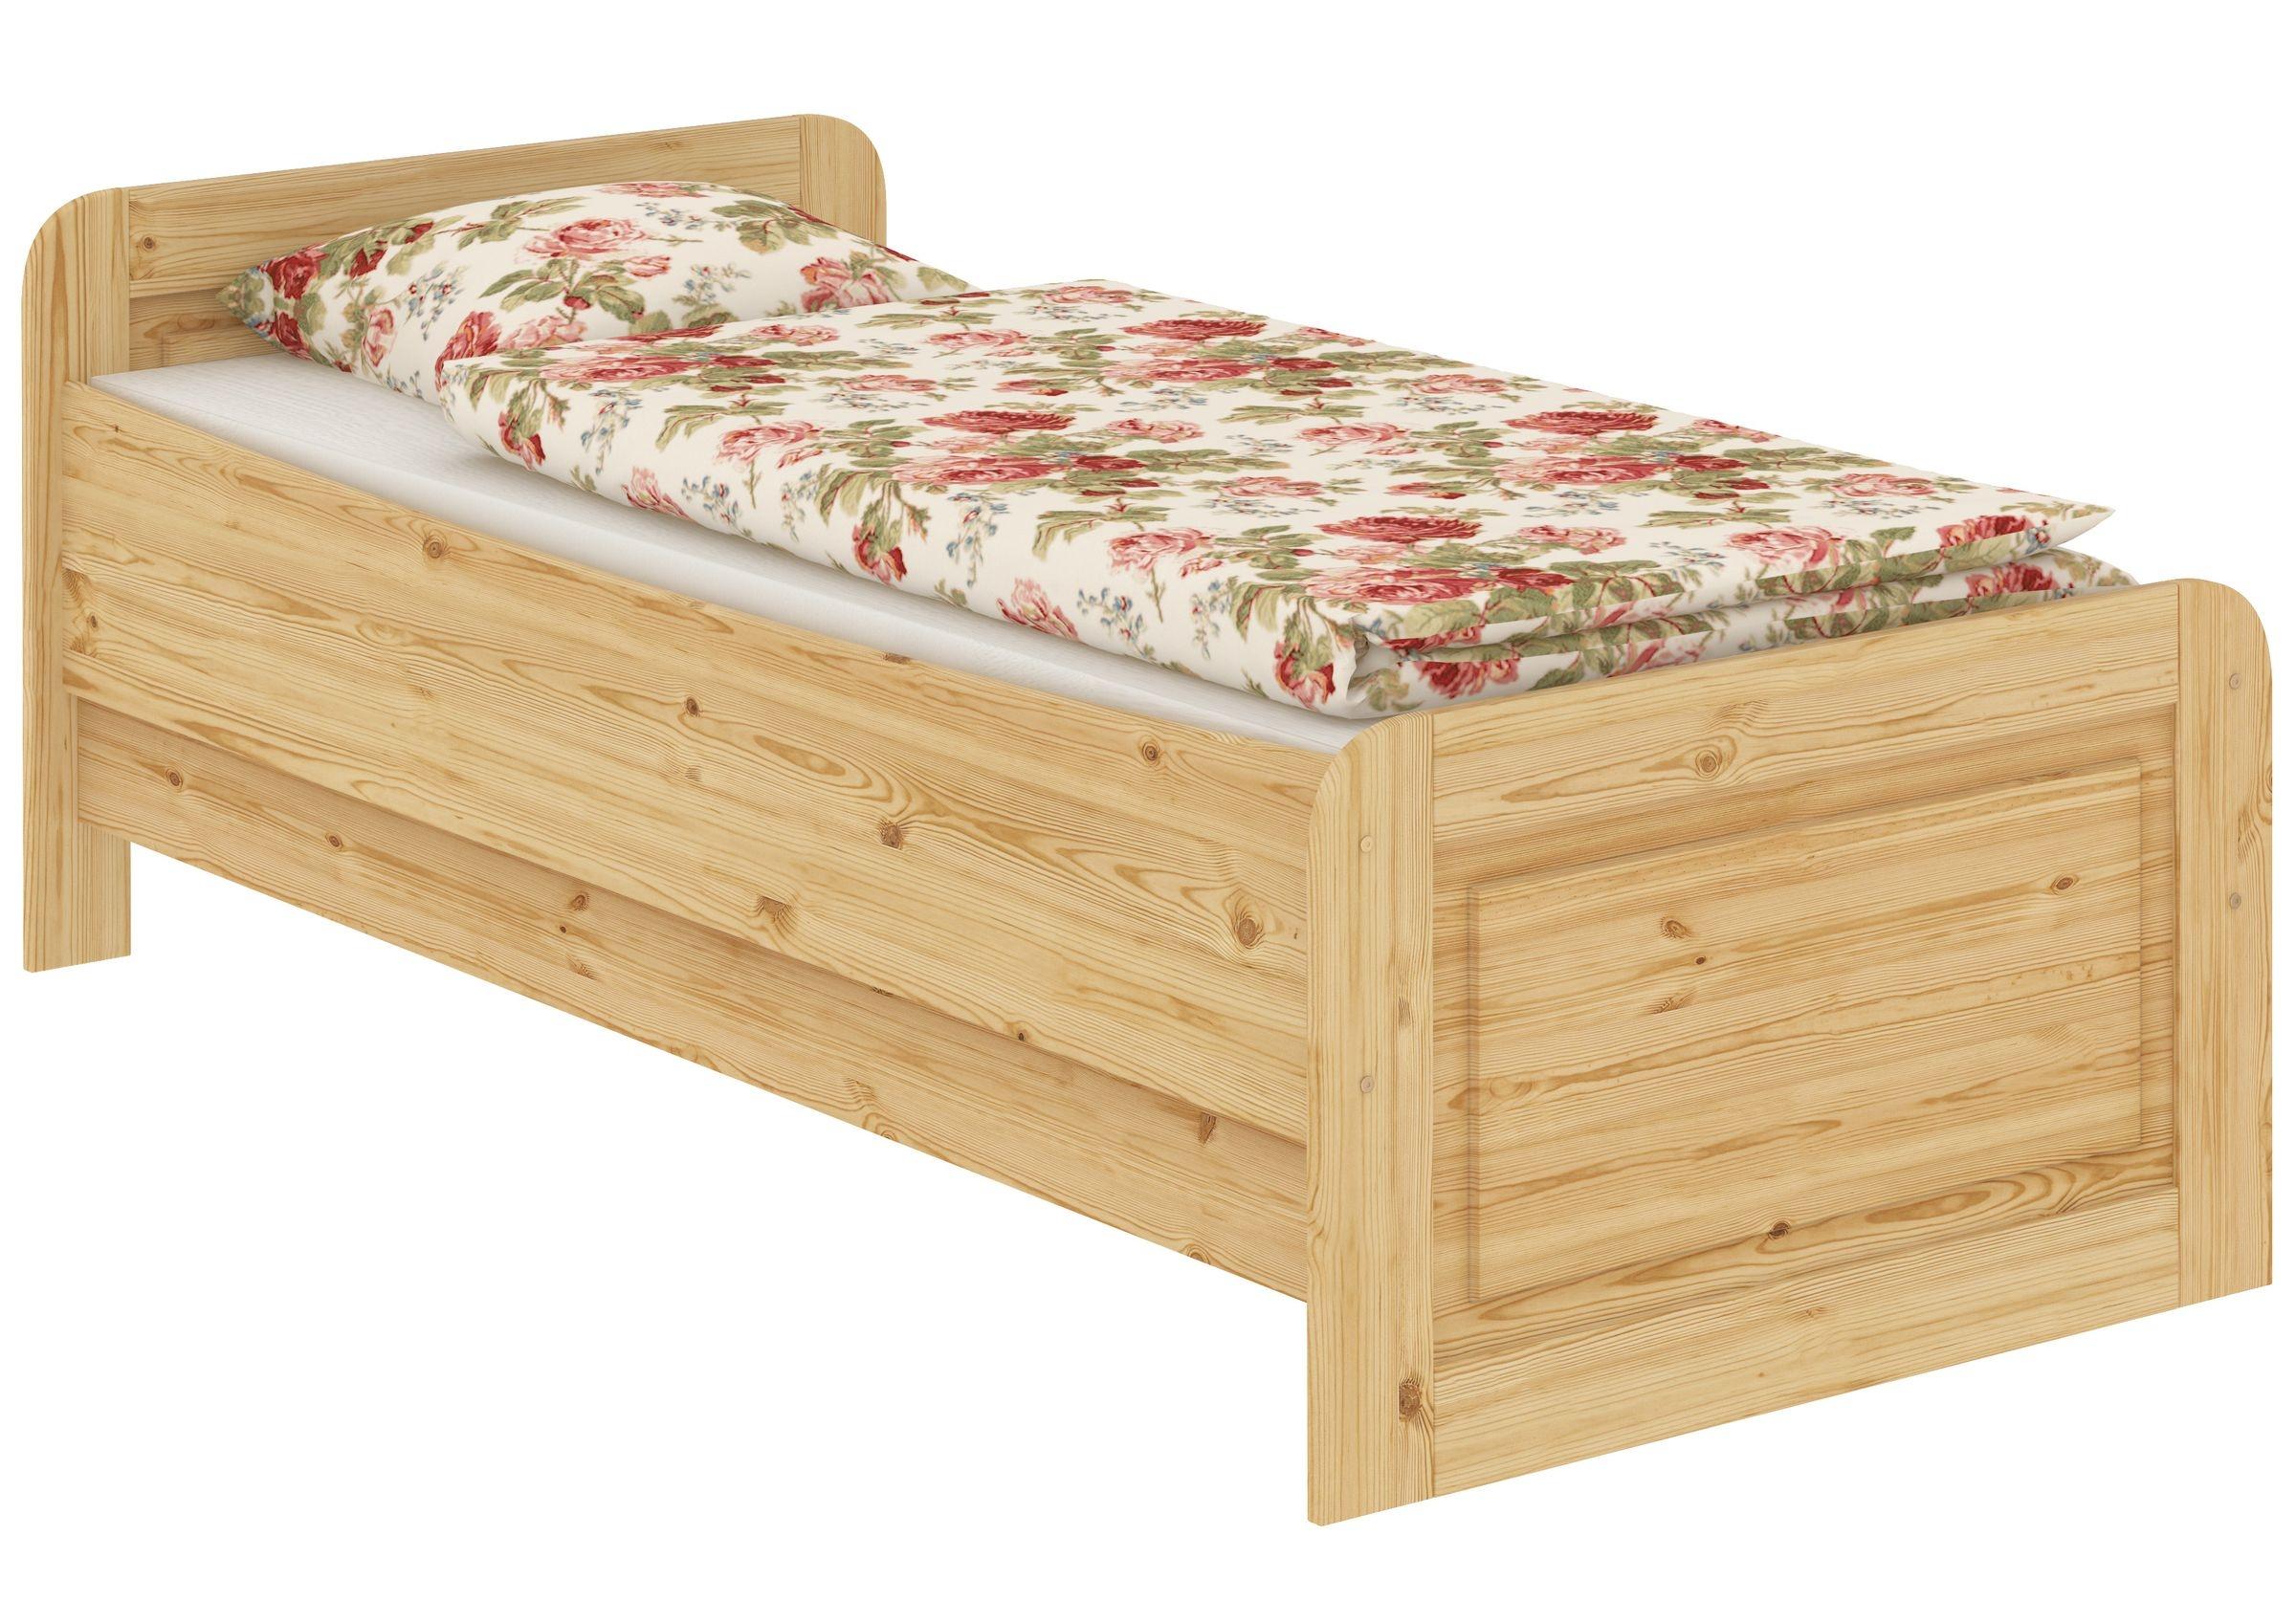 Full Size of Seniorenbett Extra Hoch 100x200 Einzelbett Holzbett Massivholz Schwebendes Bett Betten Ikea 160x200 Ruf Preise Holz Mit Matratze Und Lattenrost 180x200 Weiß Bett Bett Hoch